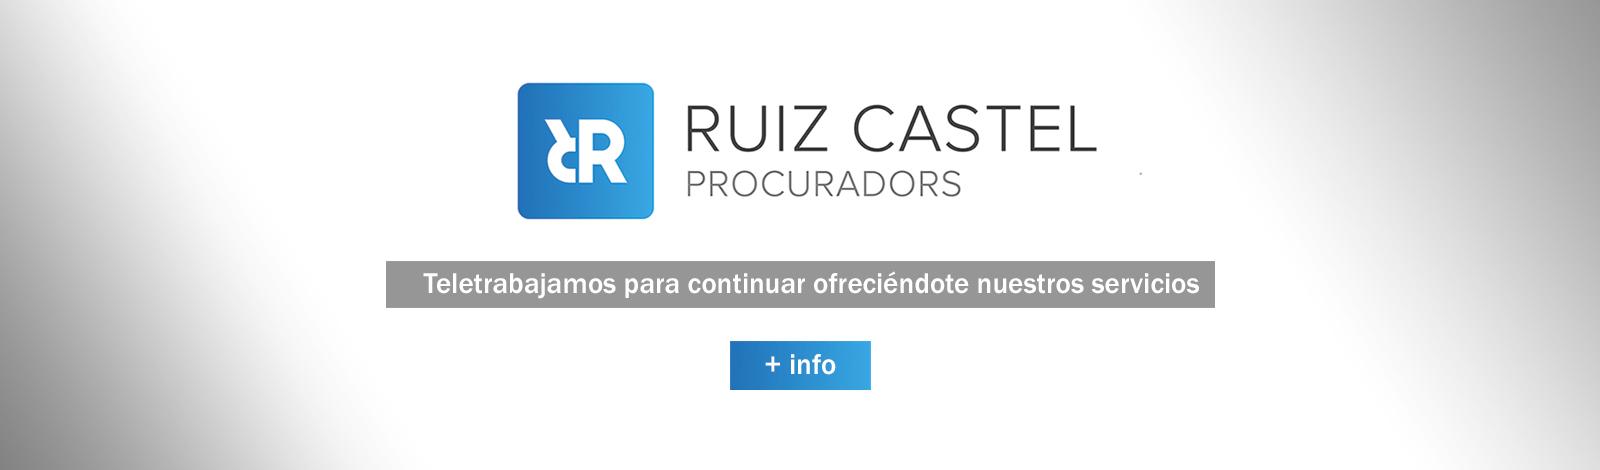 slider-ruizcastel04-cast